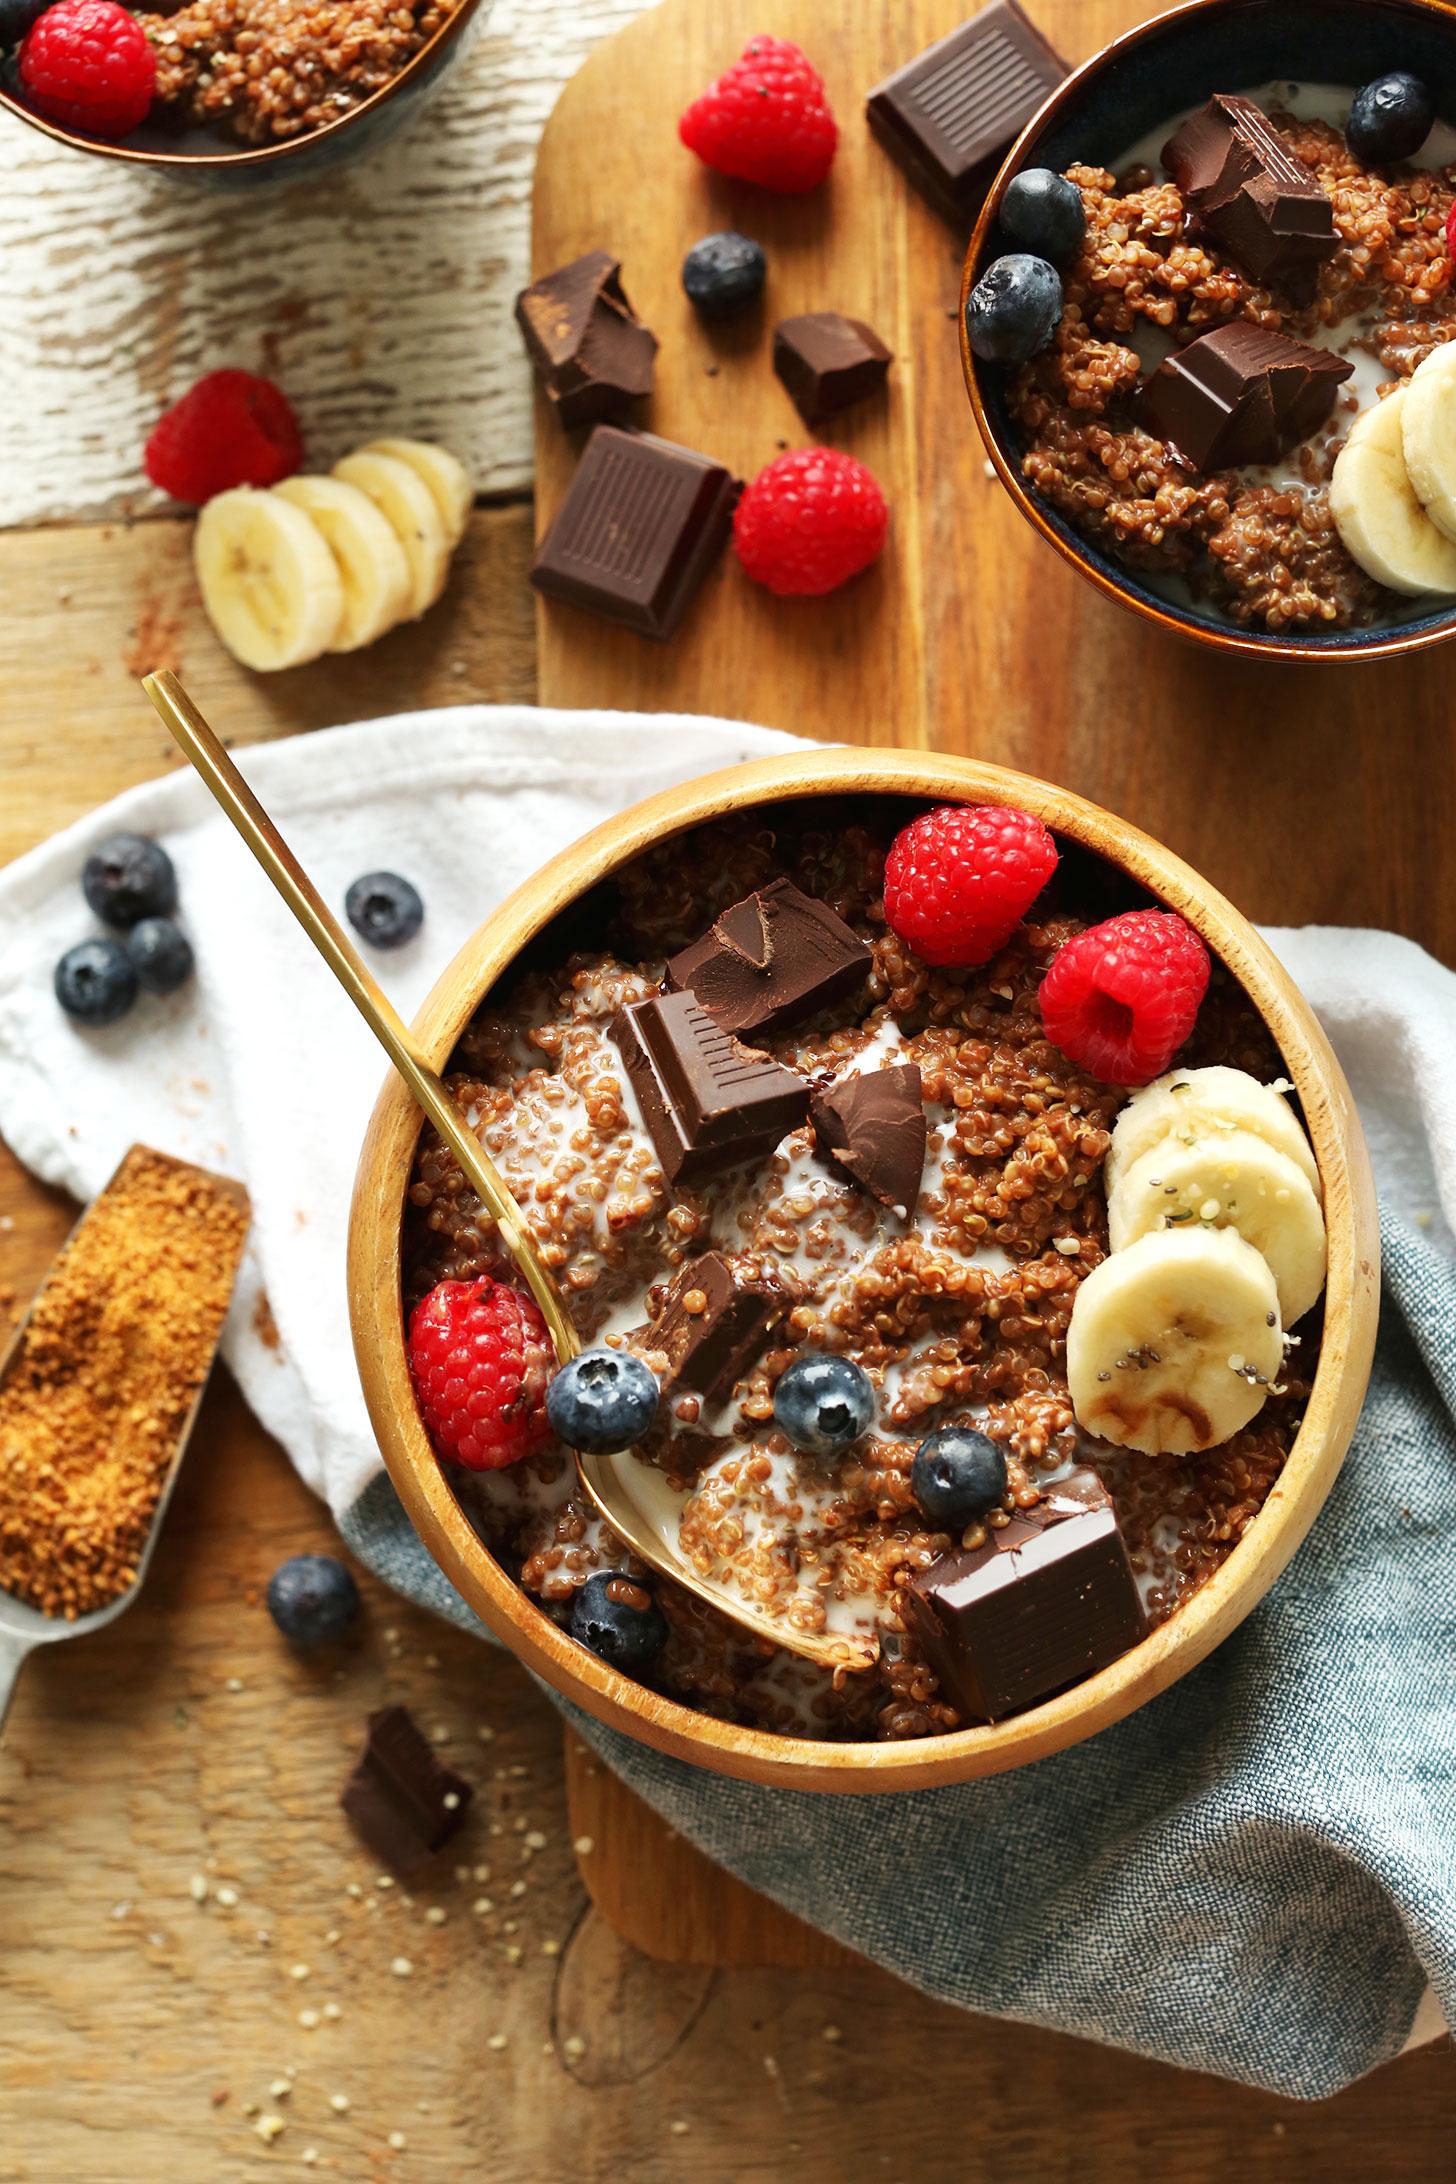 7-Ingredient-DARK-CHOCOLATE-Quinoa-Breakfast-Bowl-Full-of-antioxidants-fiber-and-protein-vegan-glutenfree-quinoa-breakfast